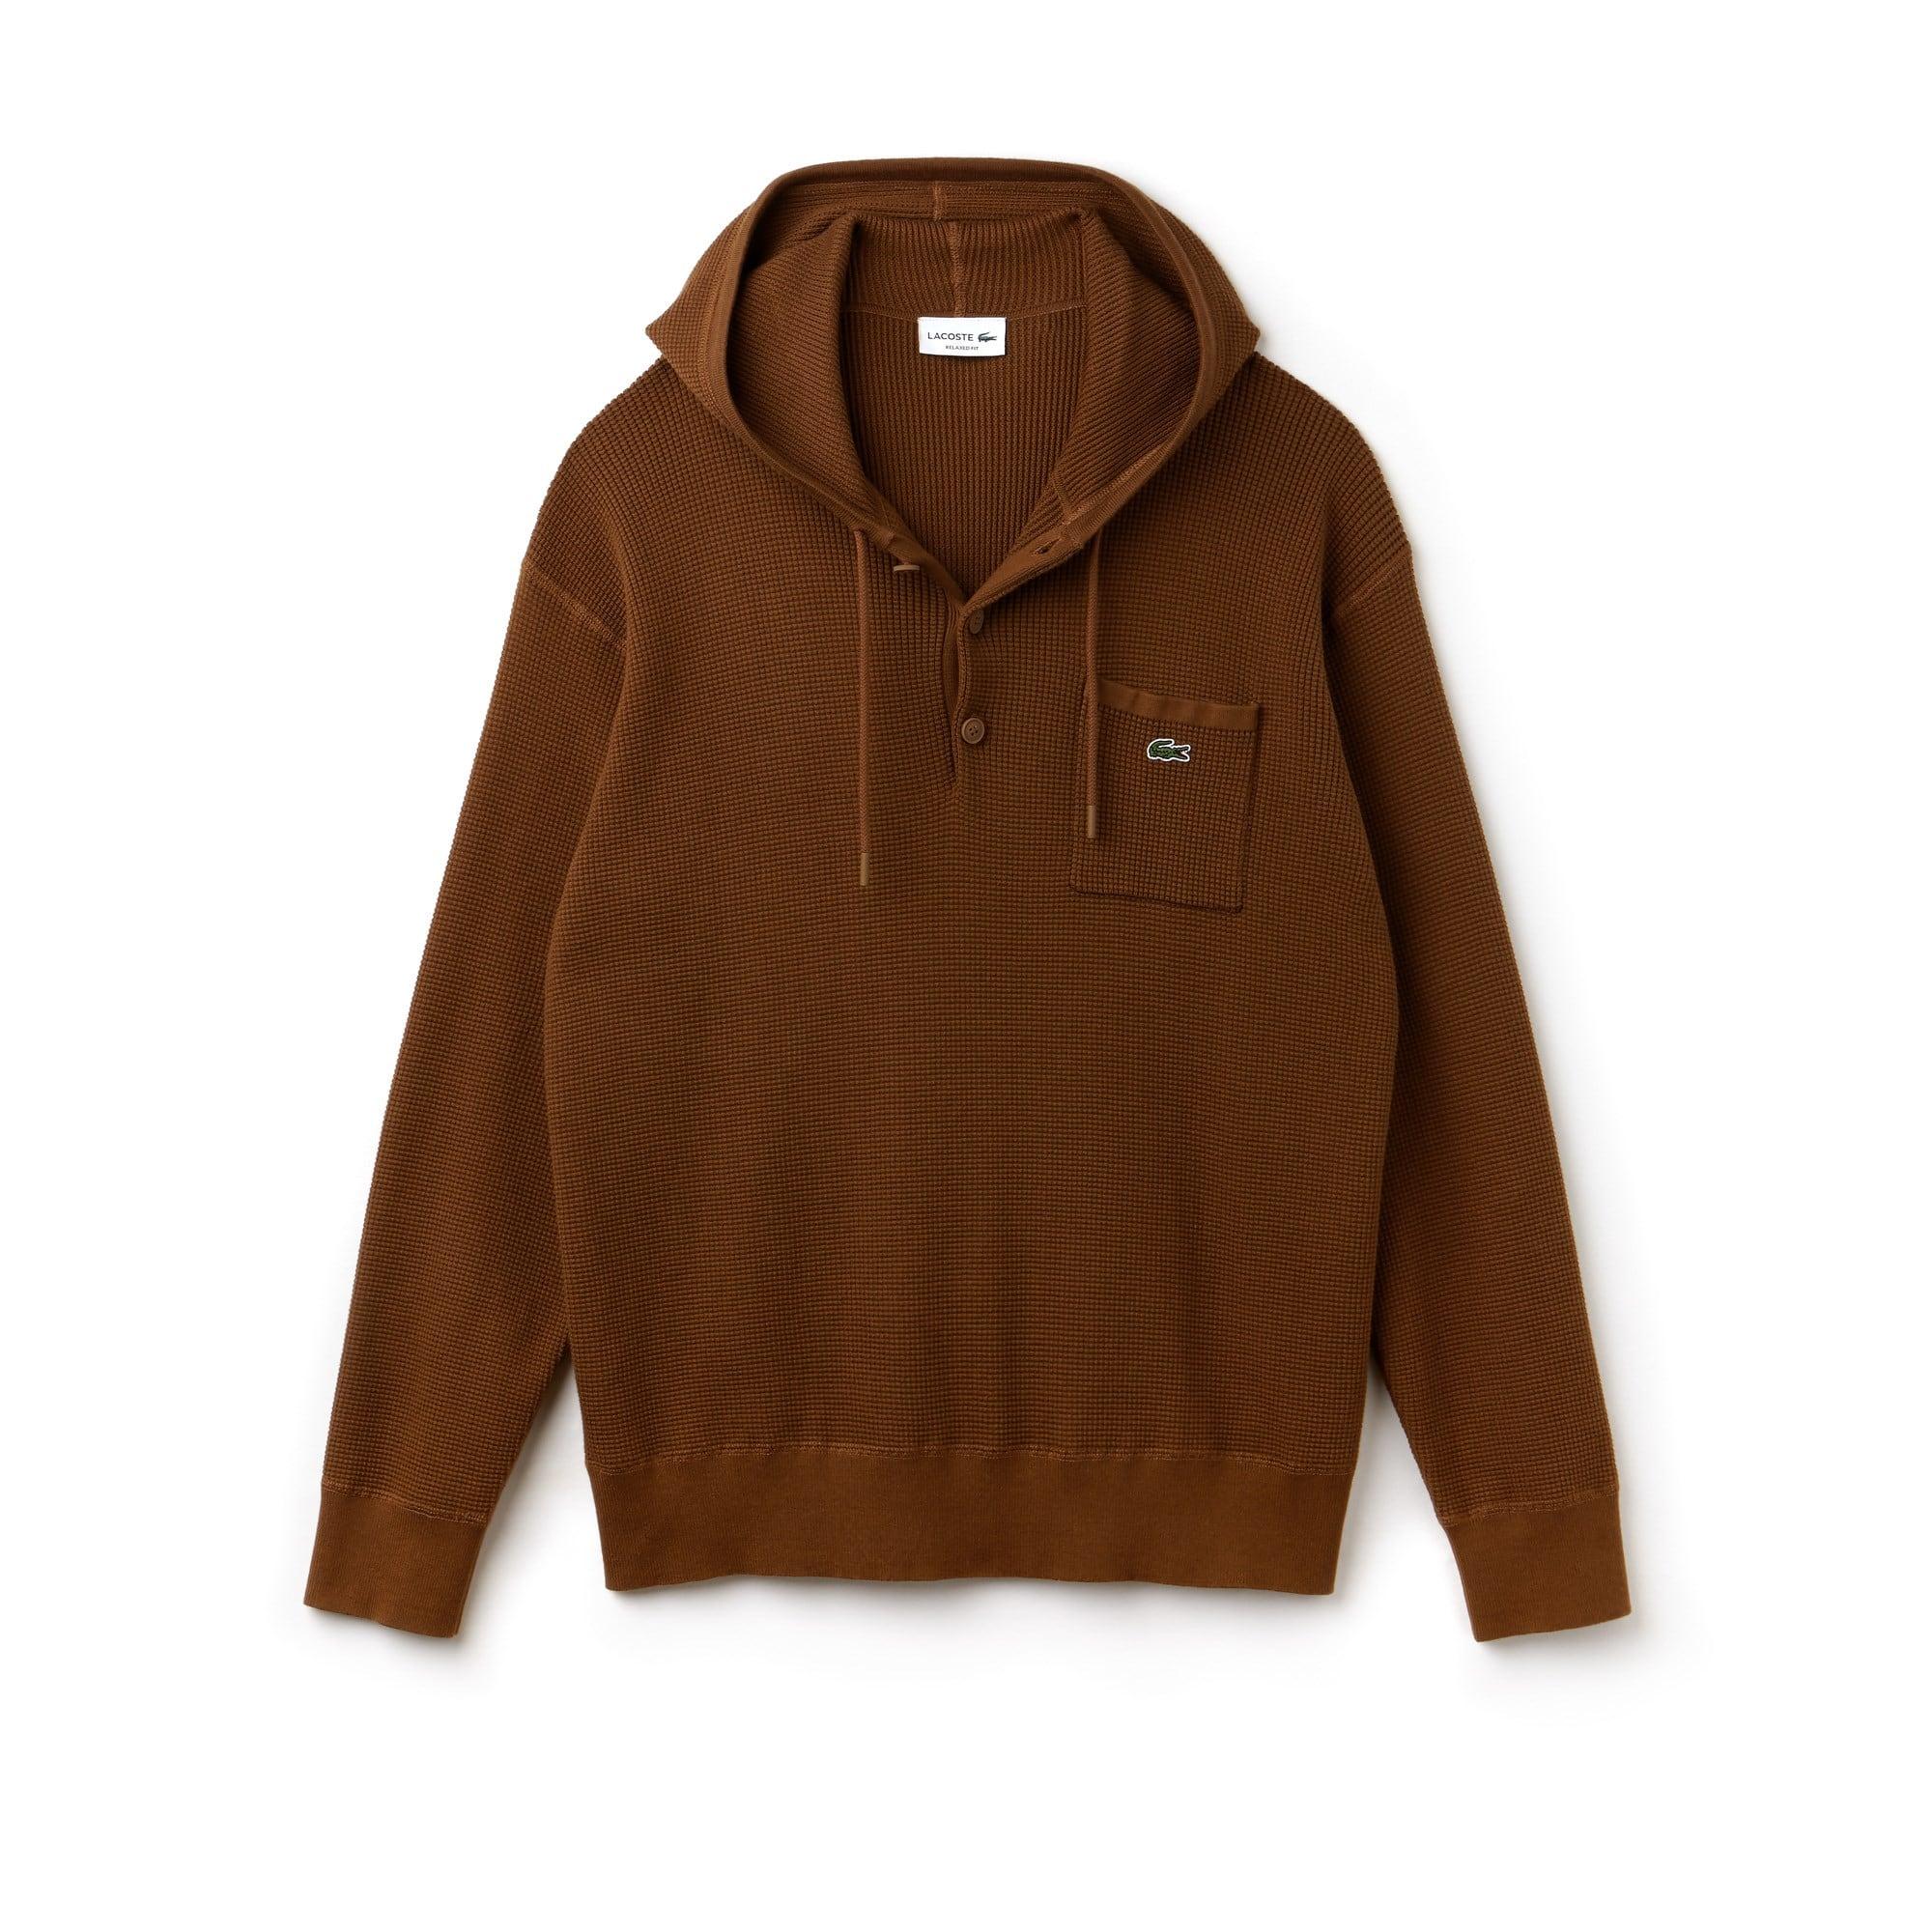 Men's Hooded Cotton Honeycomb Knit Sweatshirt